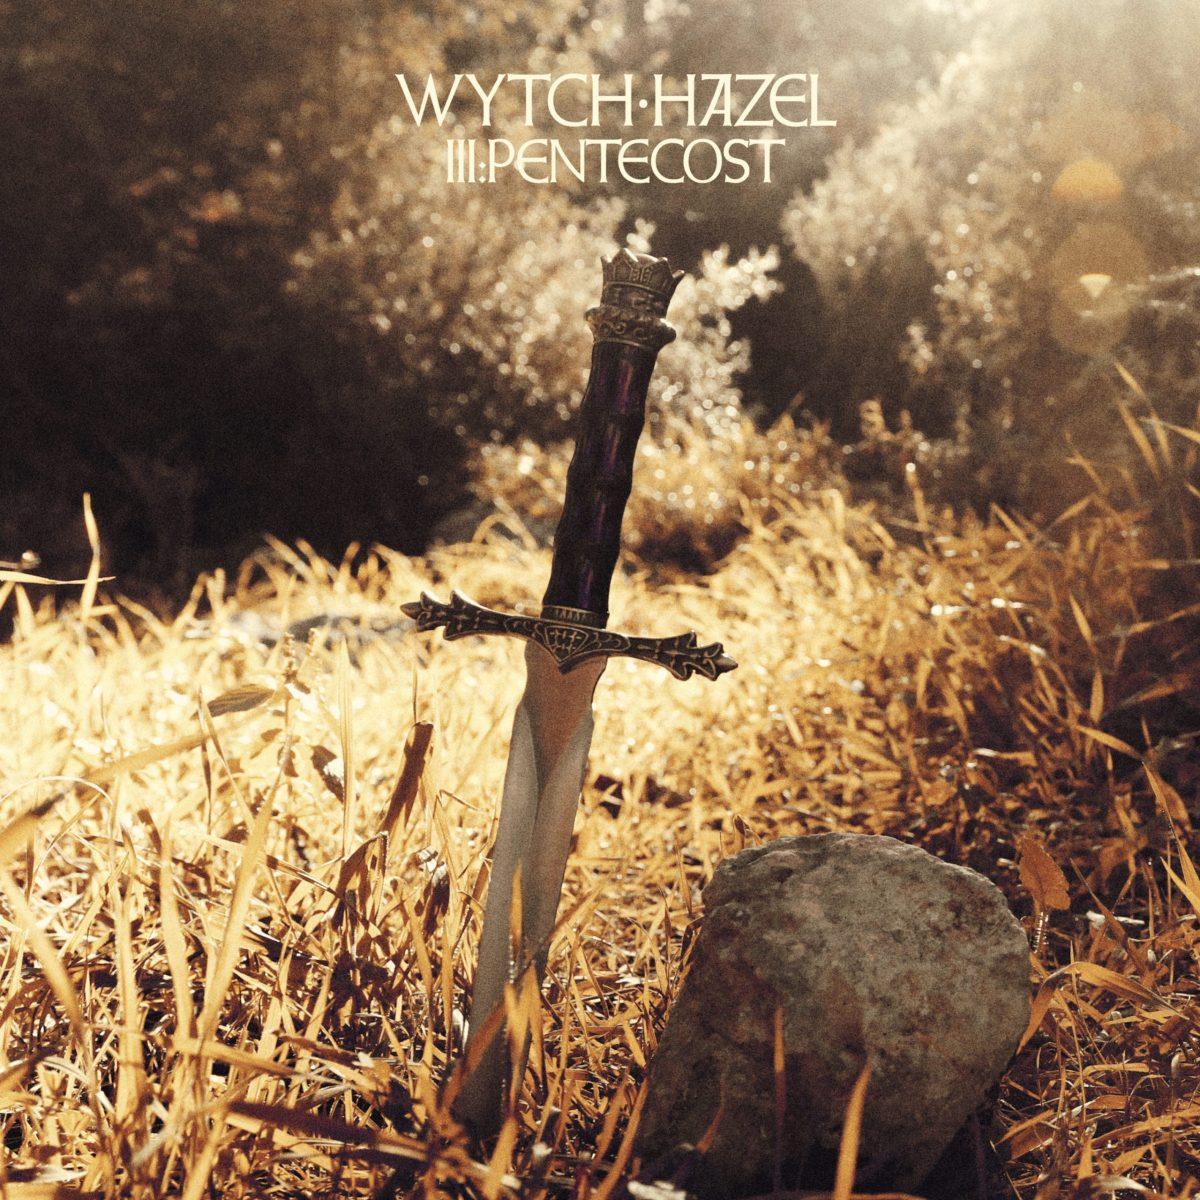 wytch-hazel-iiipentecost-album-review